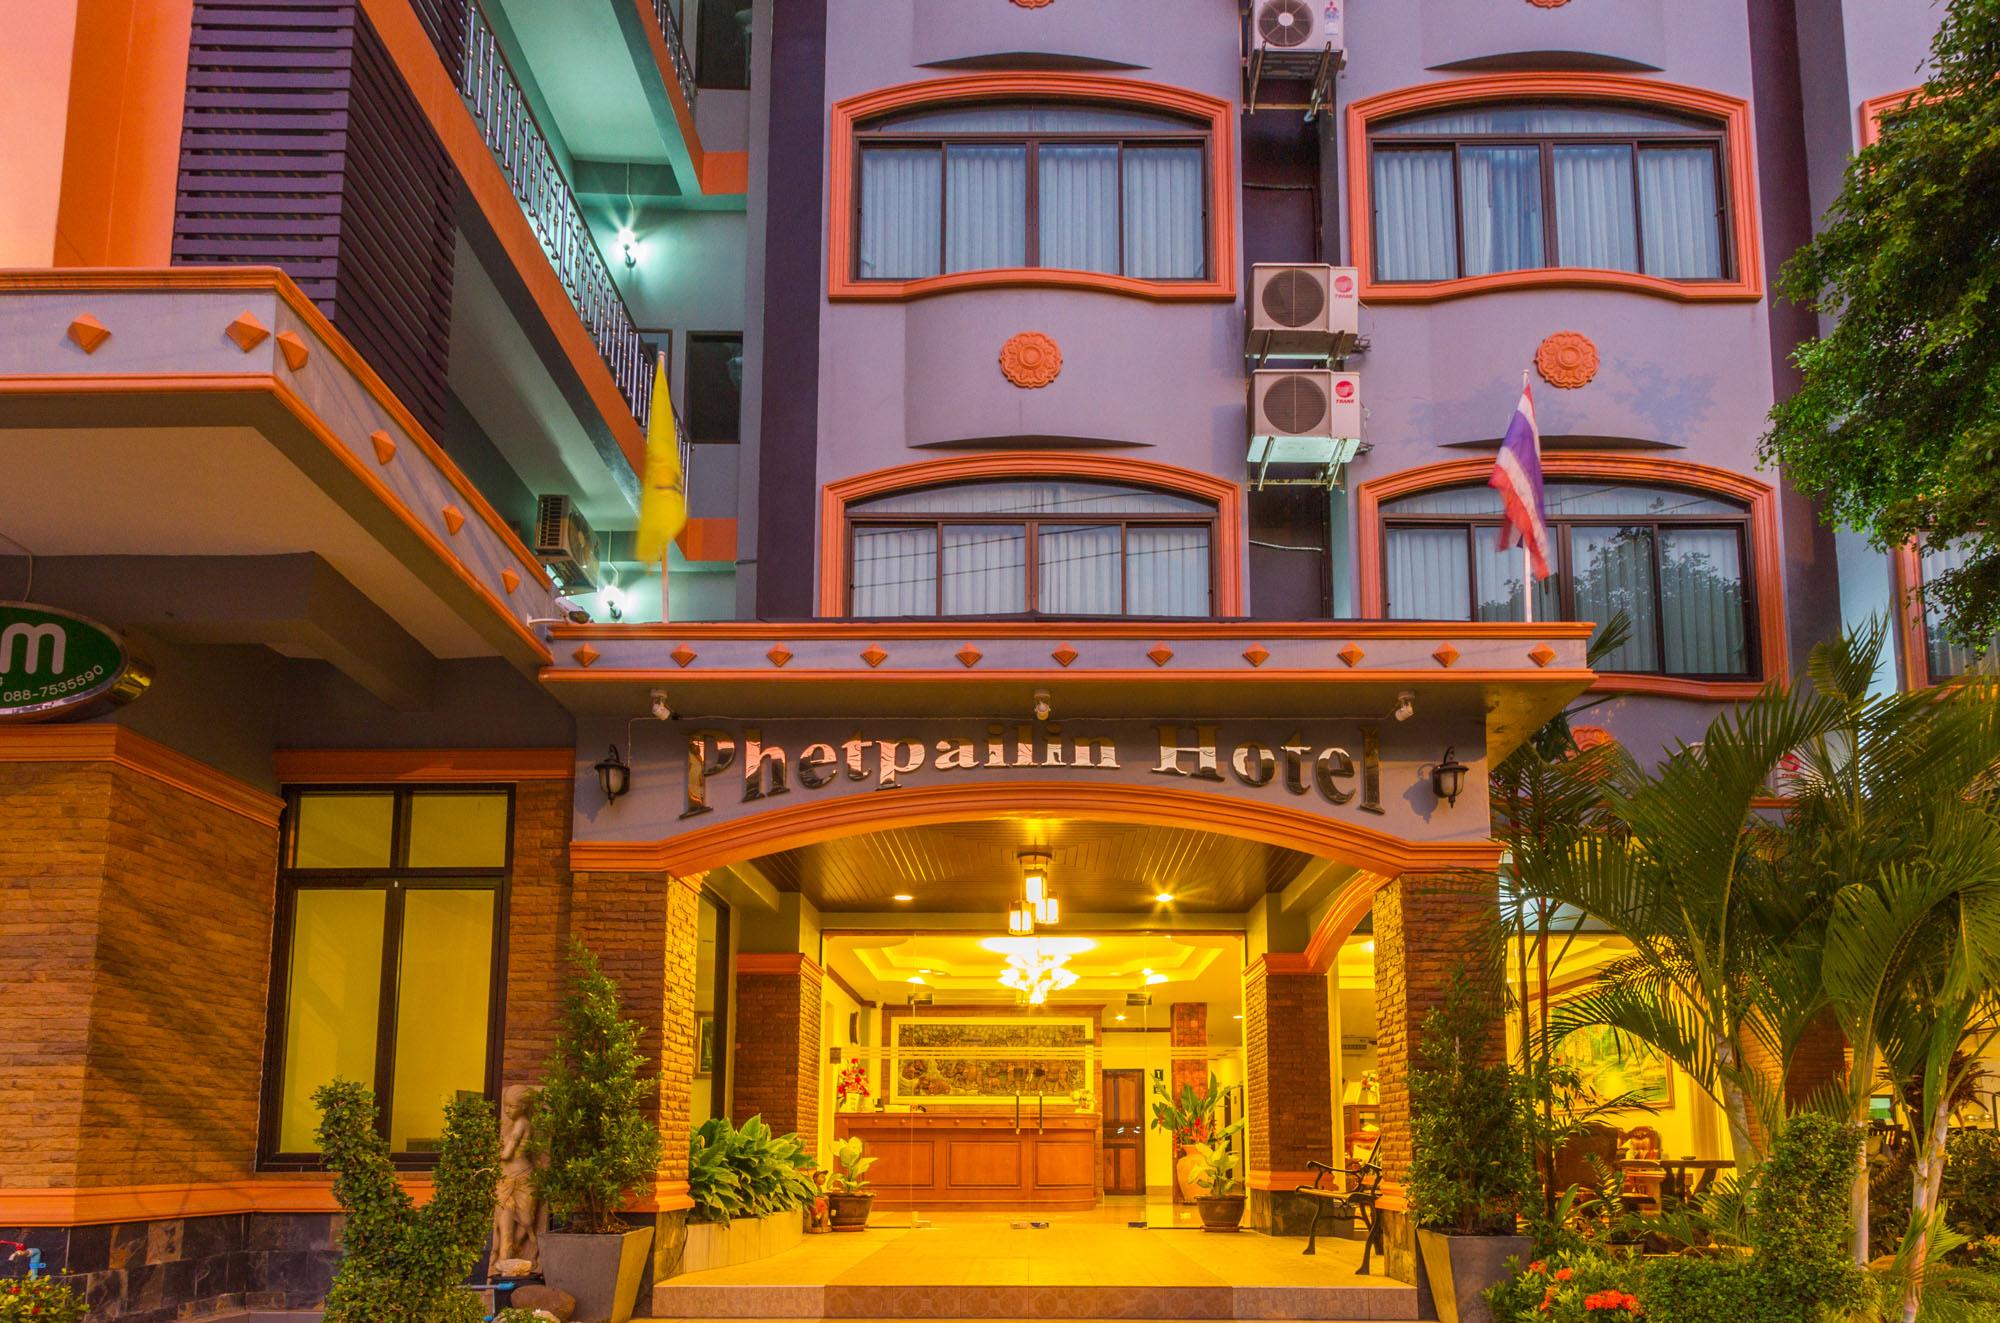 Krabi Phetpailin Hotel Halal in Krabi  โรงแรมกระบี่เพชรไพลิน โฮเทล (Krabi Phetpailin Hotel) Halal IMG 0012